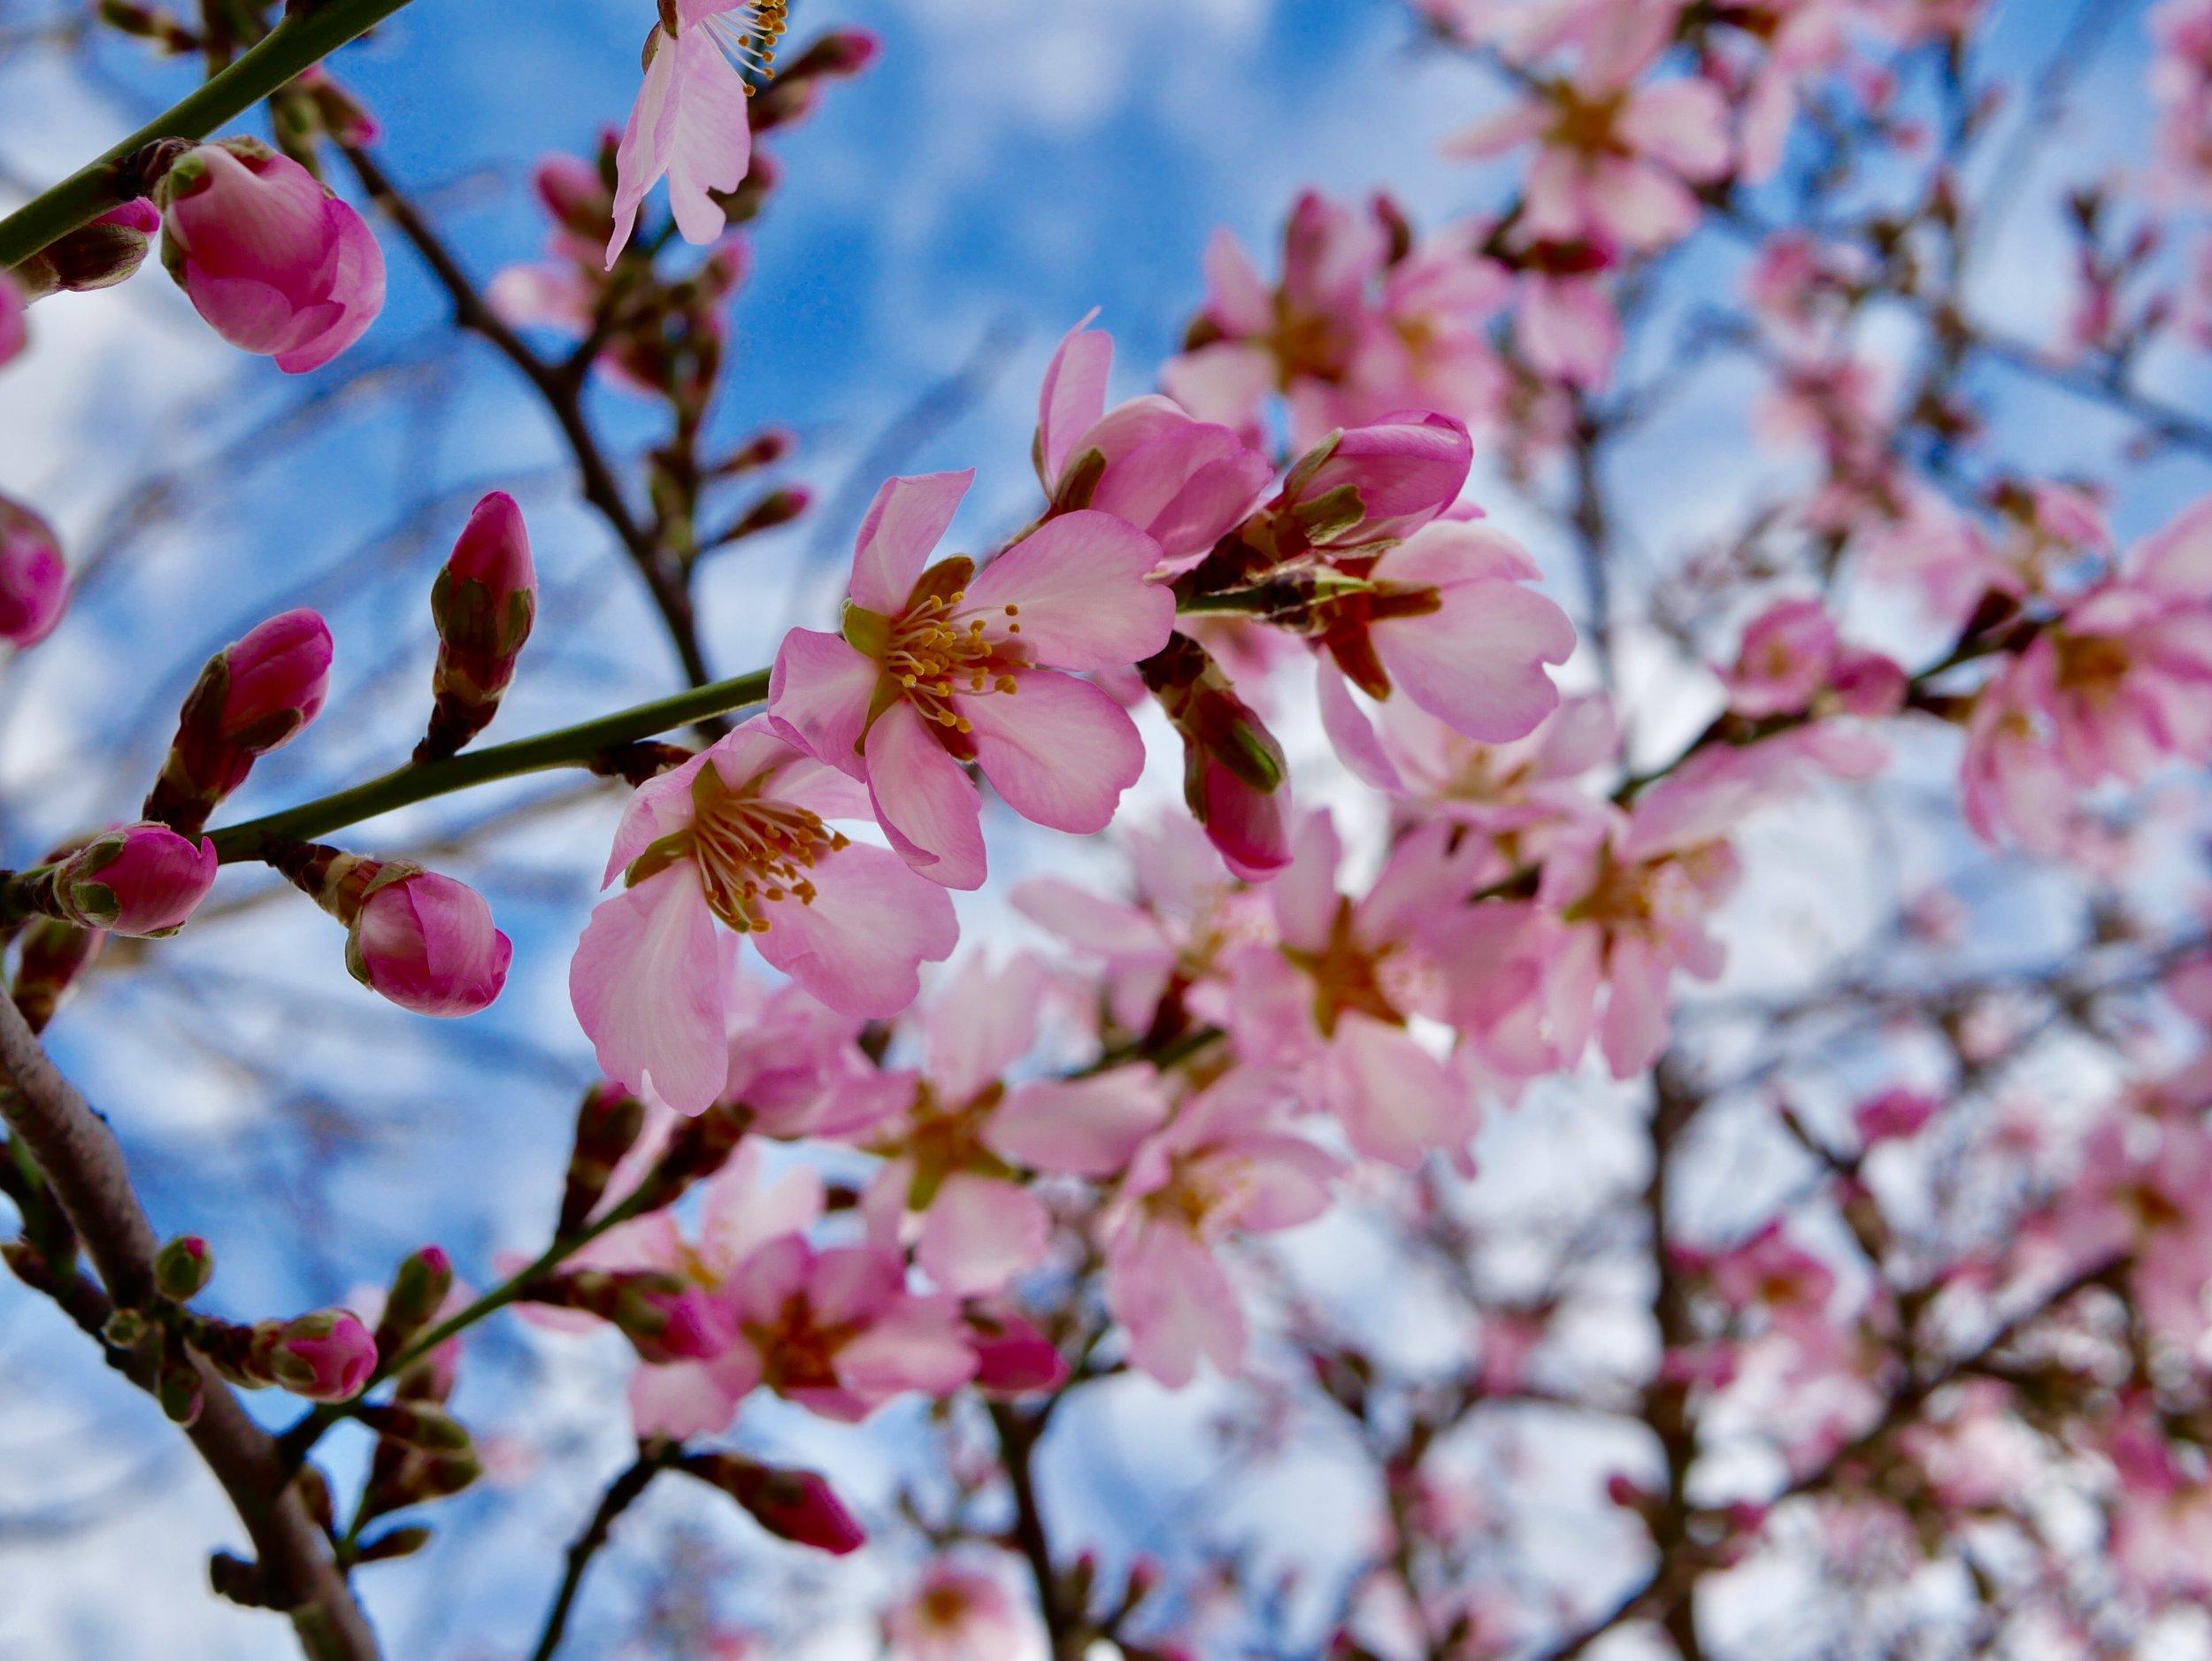 Pink blossom on almond tree